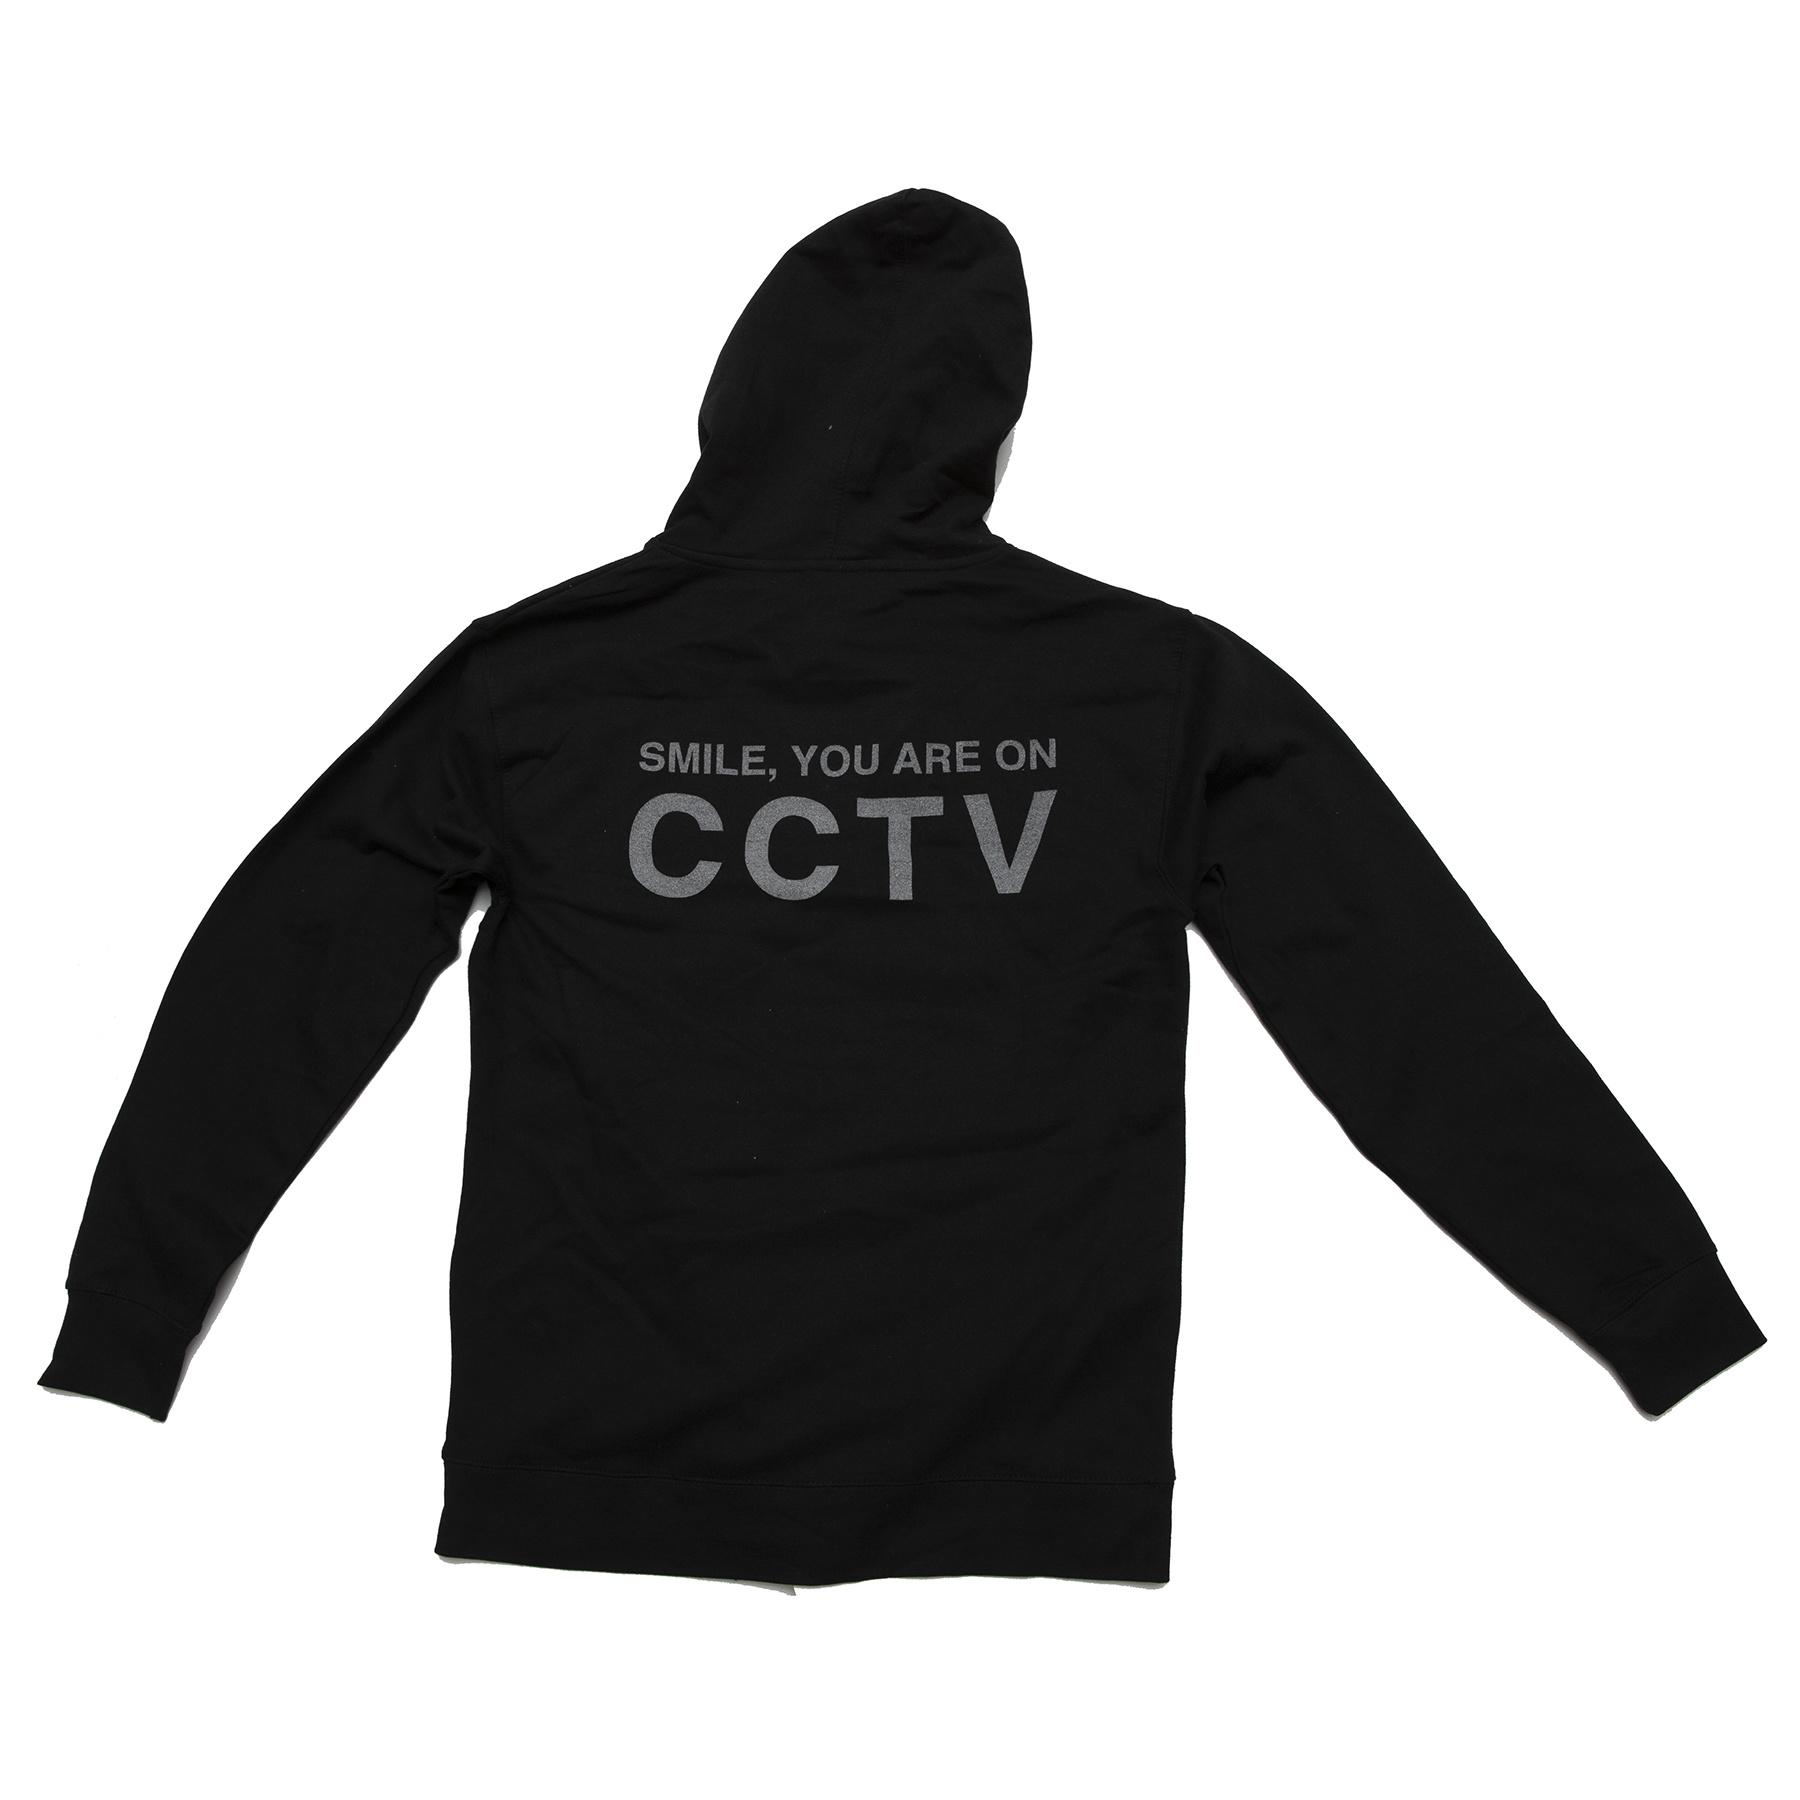 MASH CCTV Hooded Pullover Black Or Neon